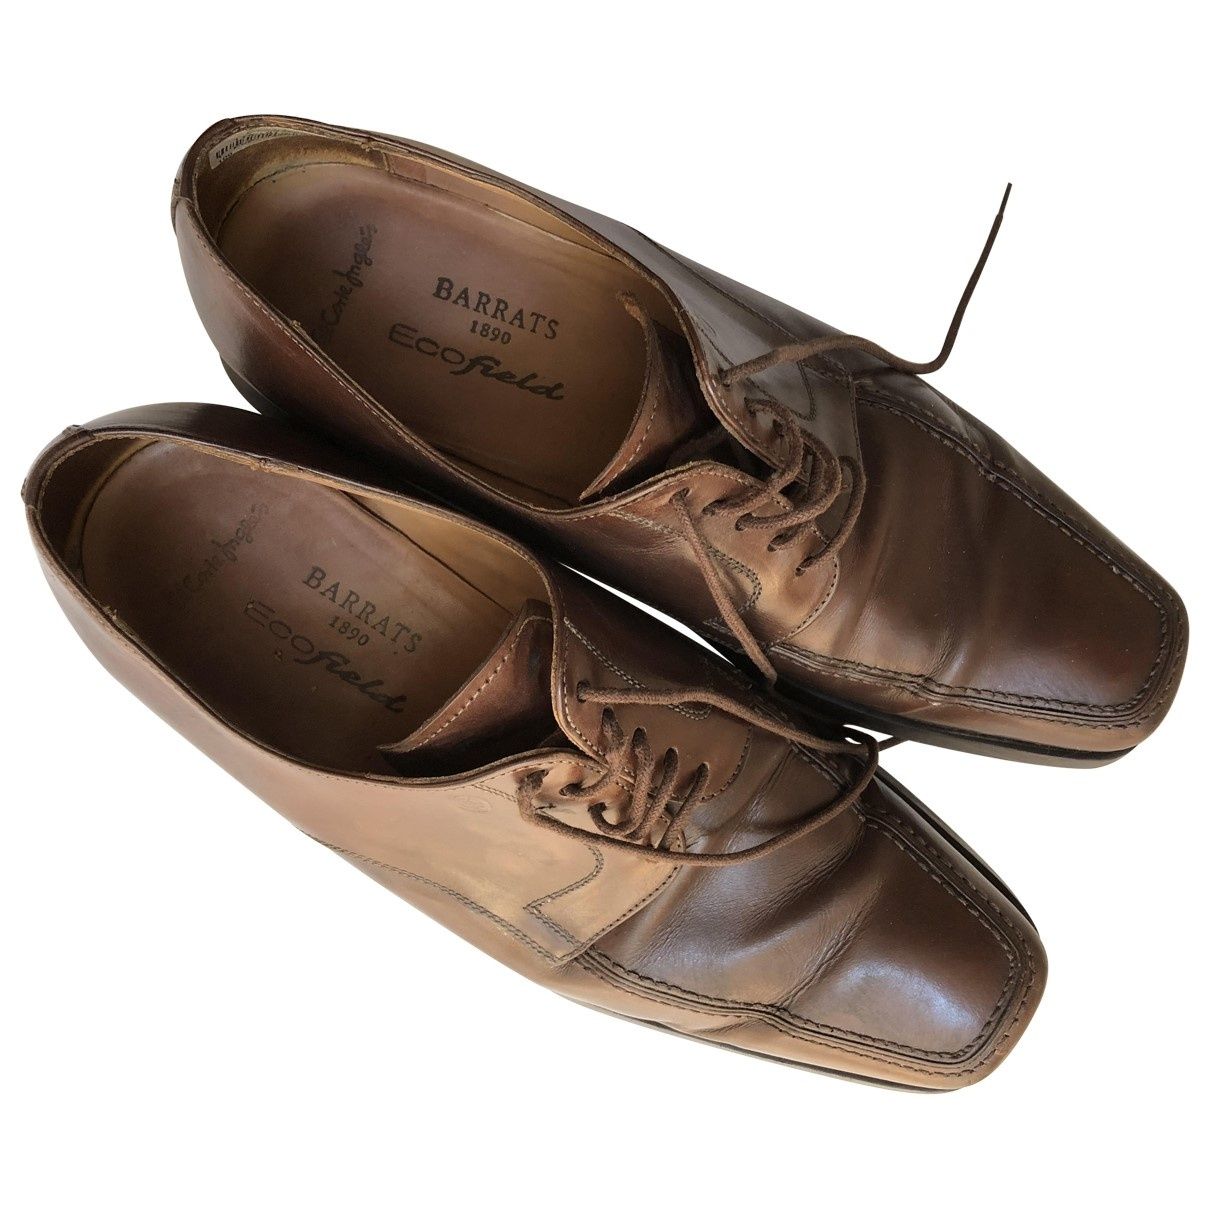 Barrats \N Brown Leather Lace ups for Men 43 EU